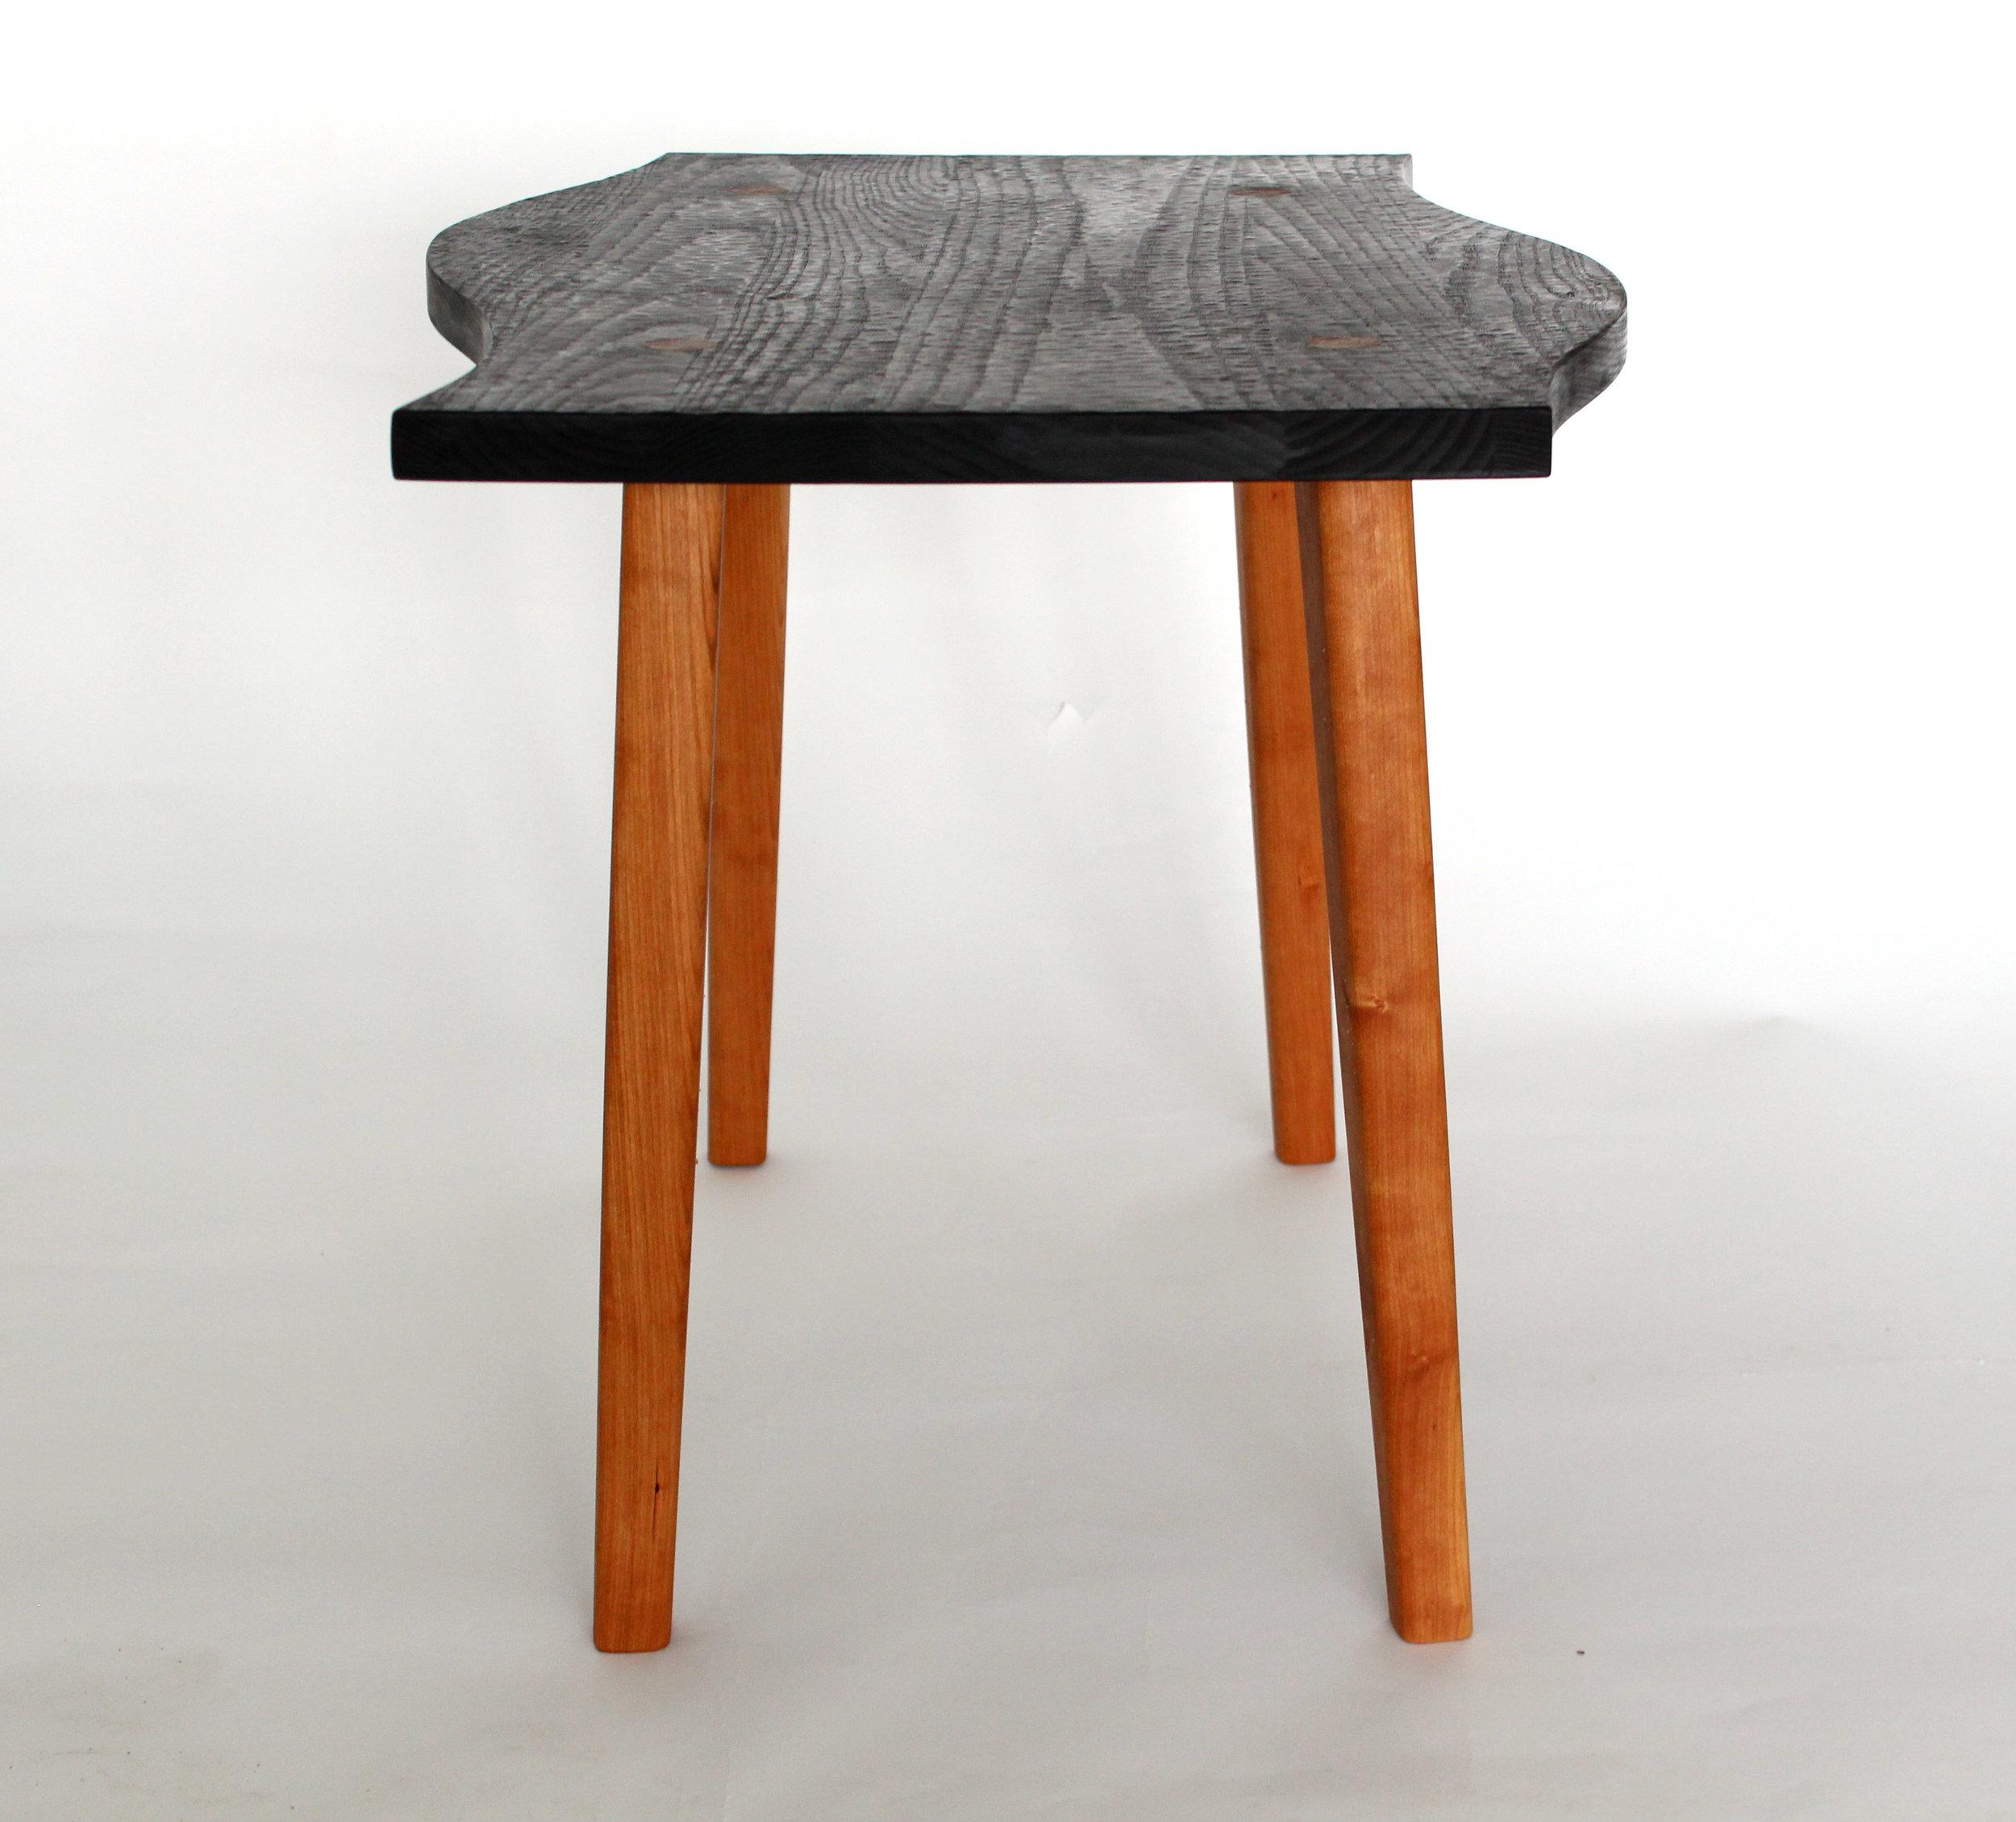 04 senft table.jpg